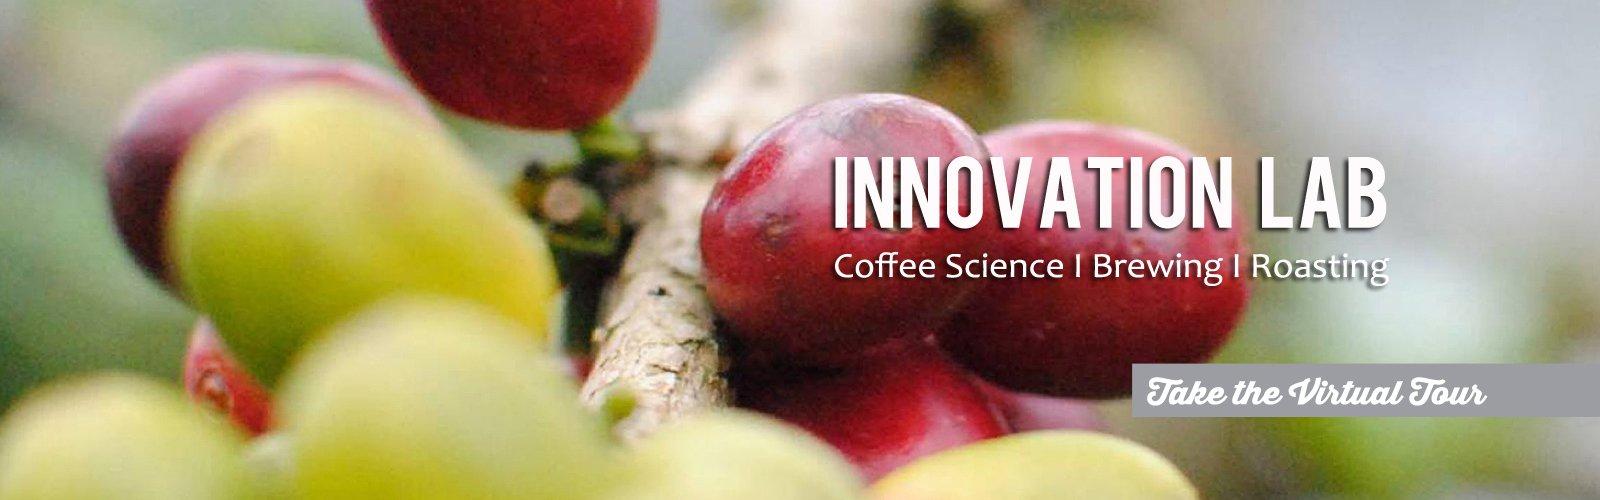 Innovation Lab_Virtual Tour